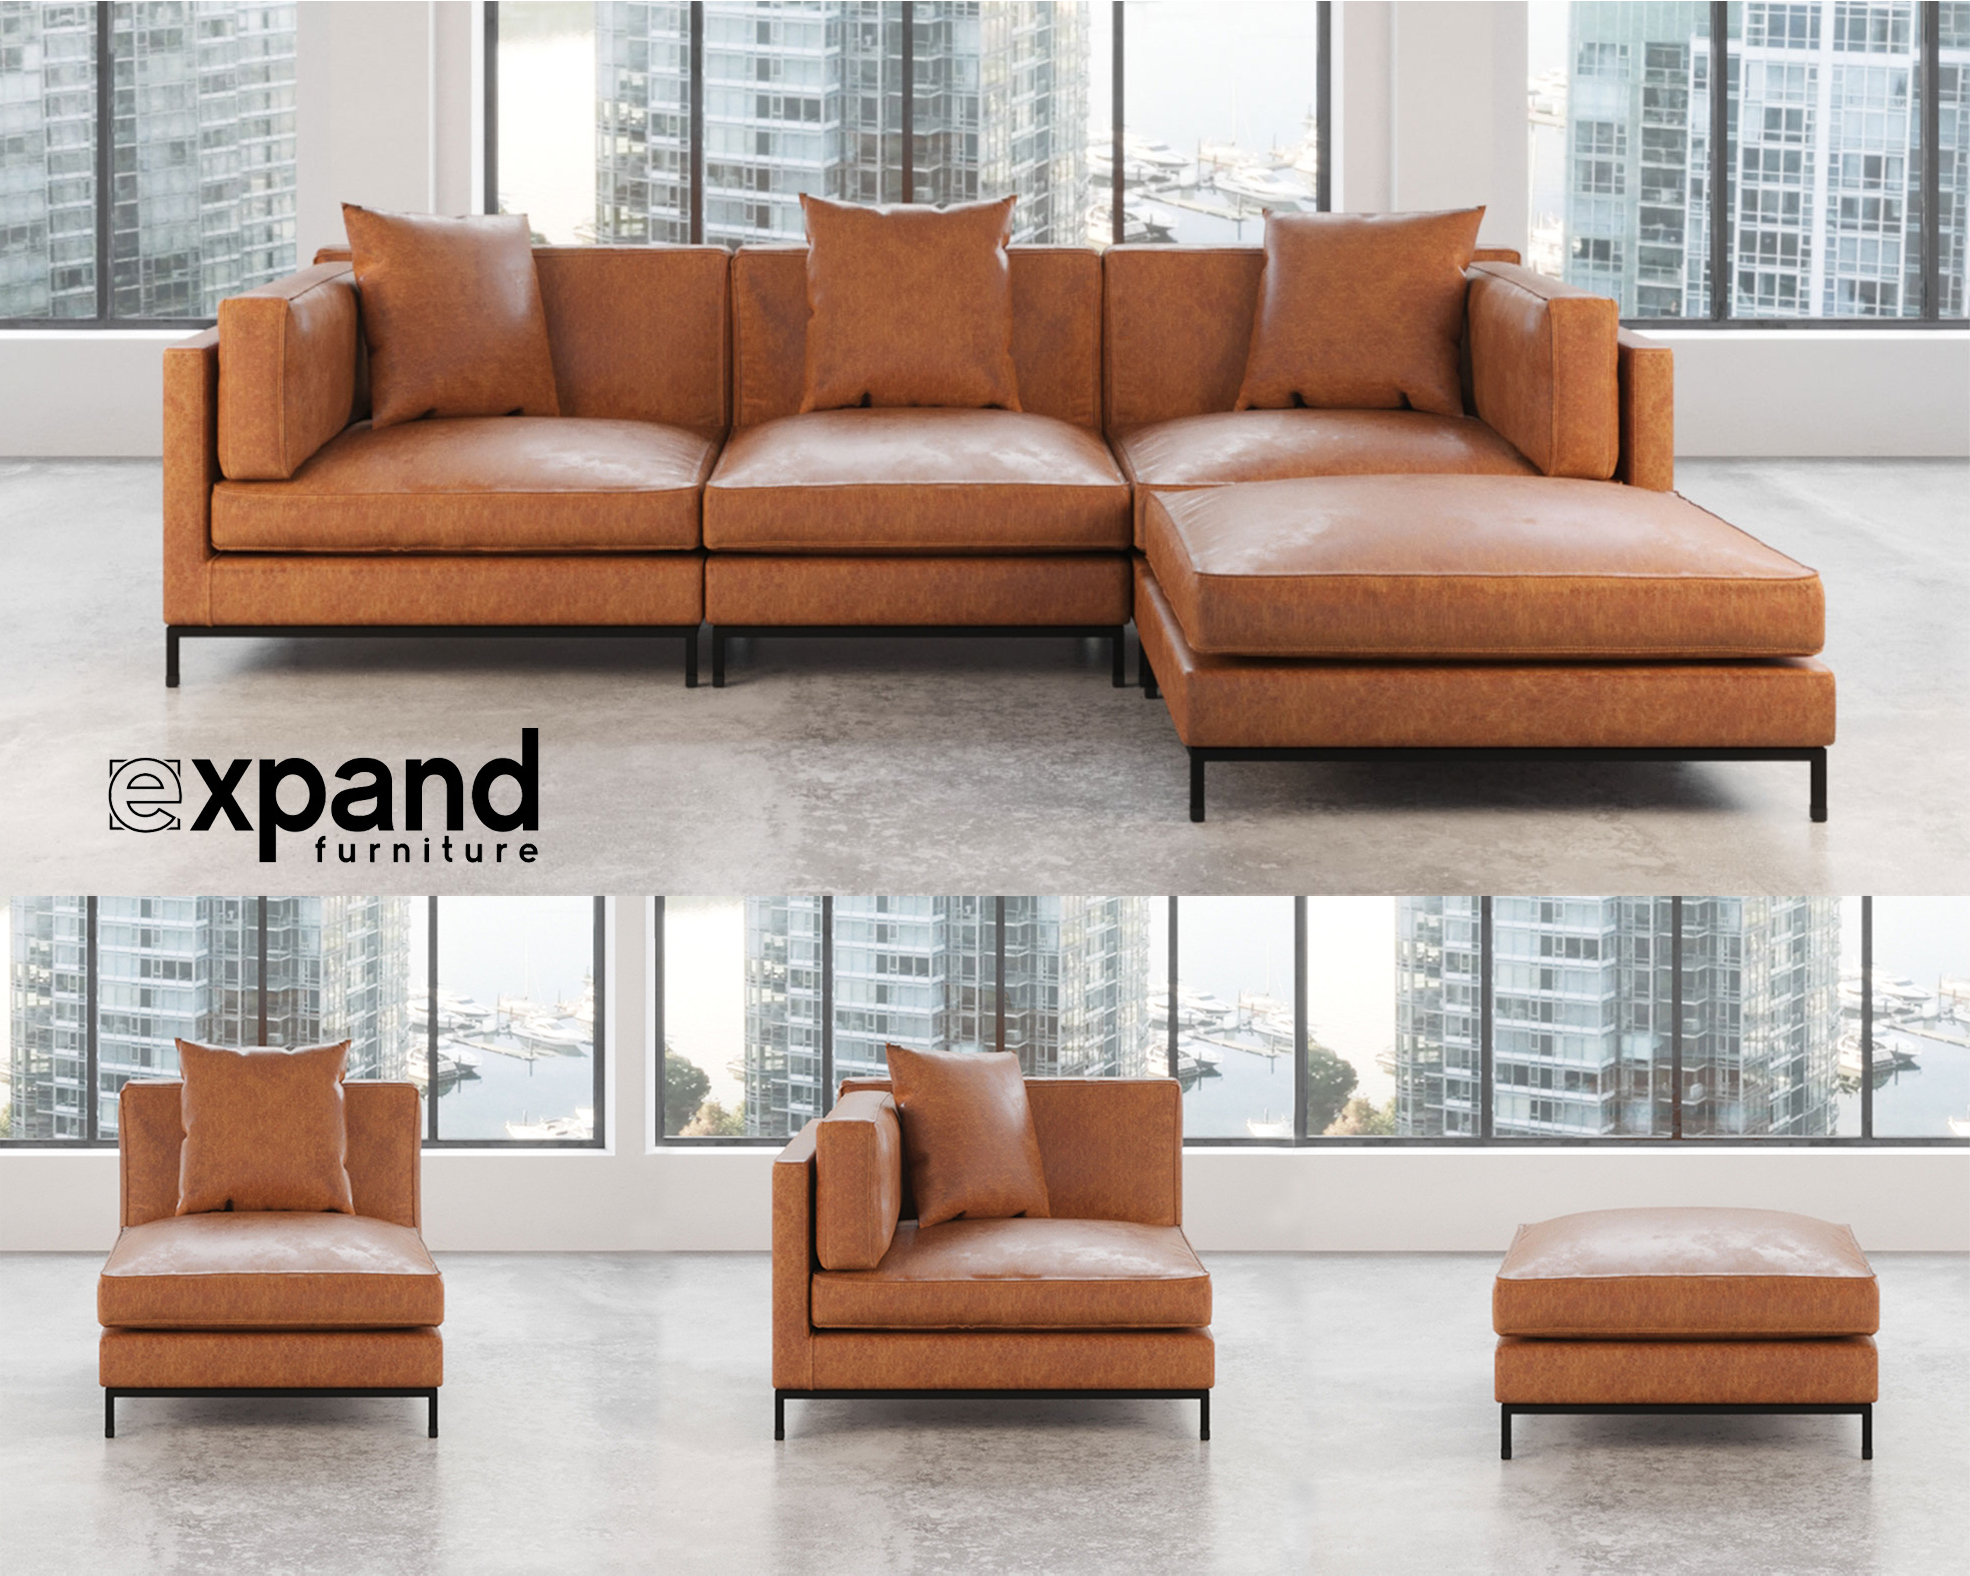 Expand Furniture Announces Space-Saving Urban Modular Sofa Line